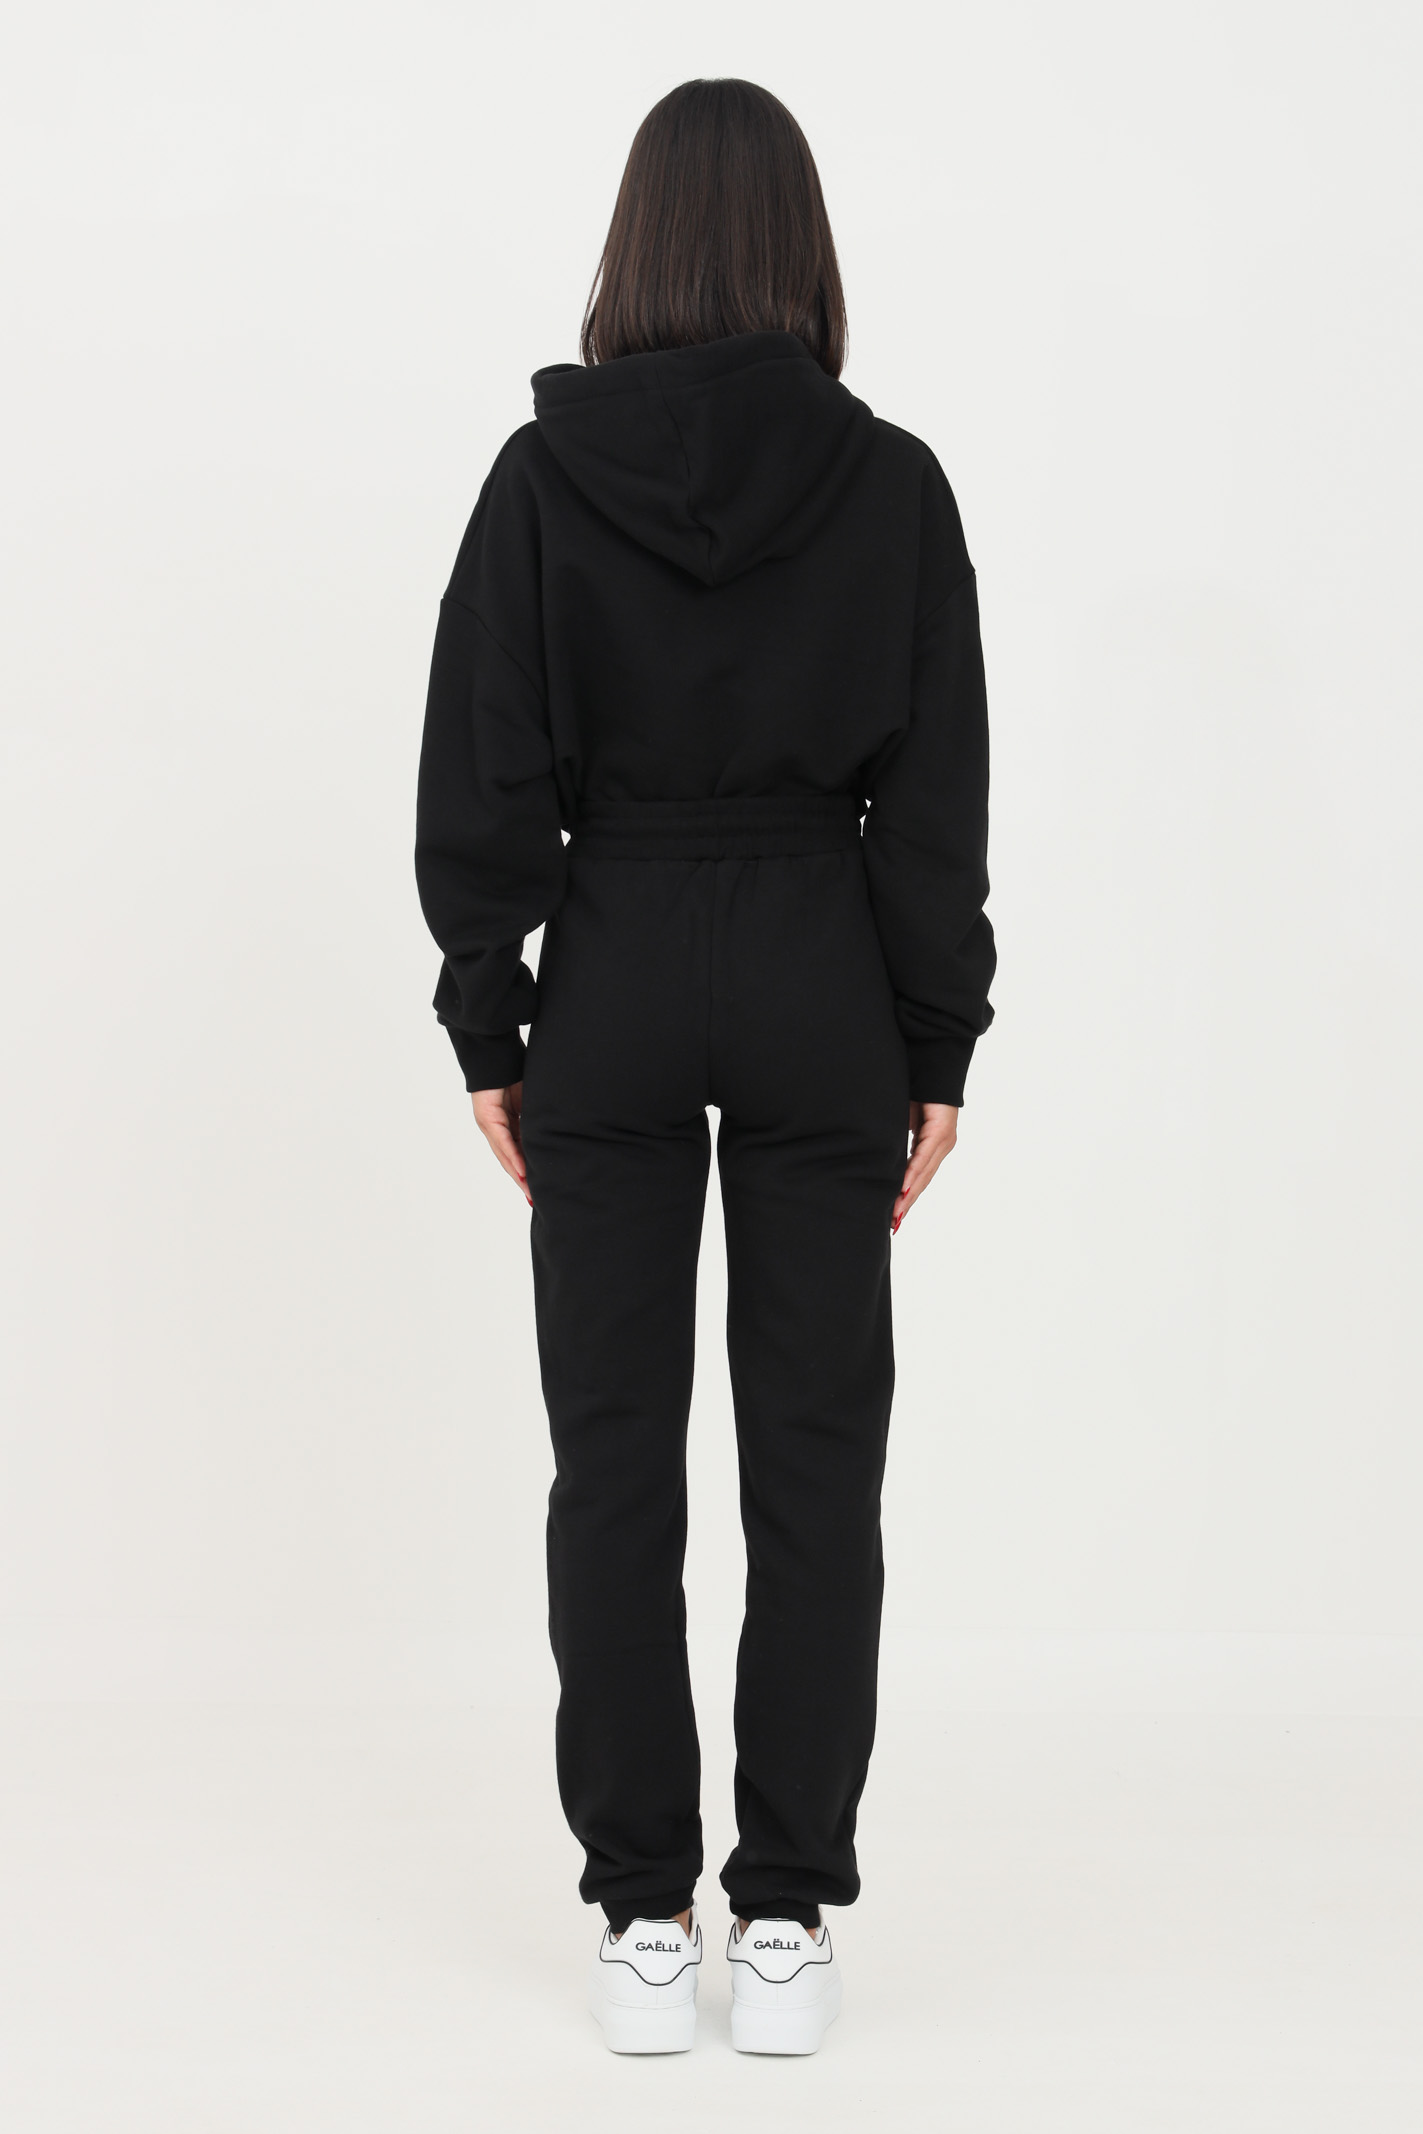 Pantaloni donna nero Gaelle | GBD10137NERO